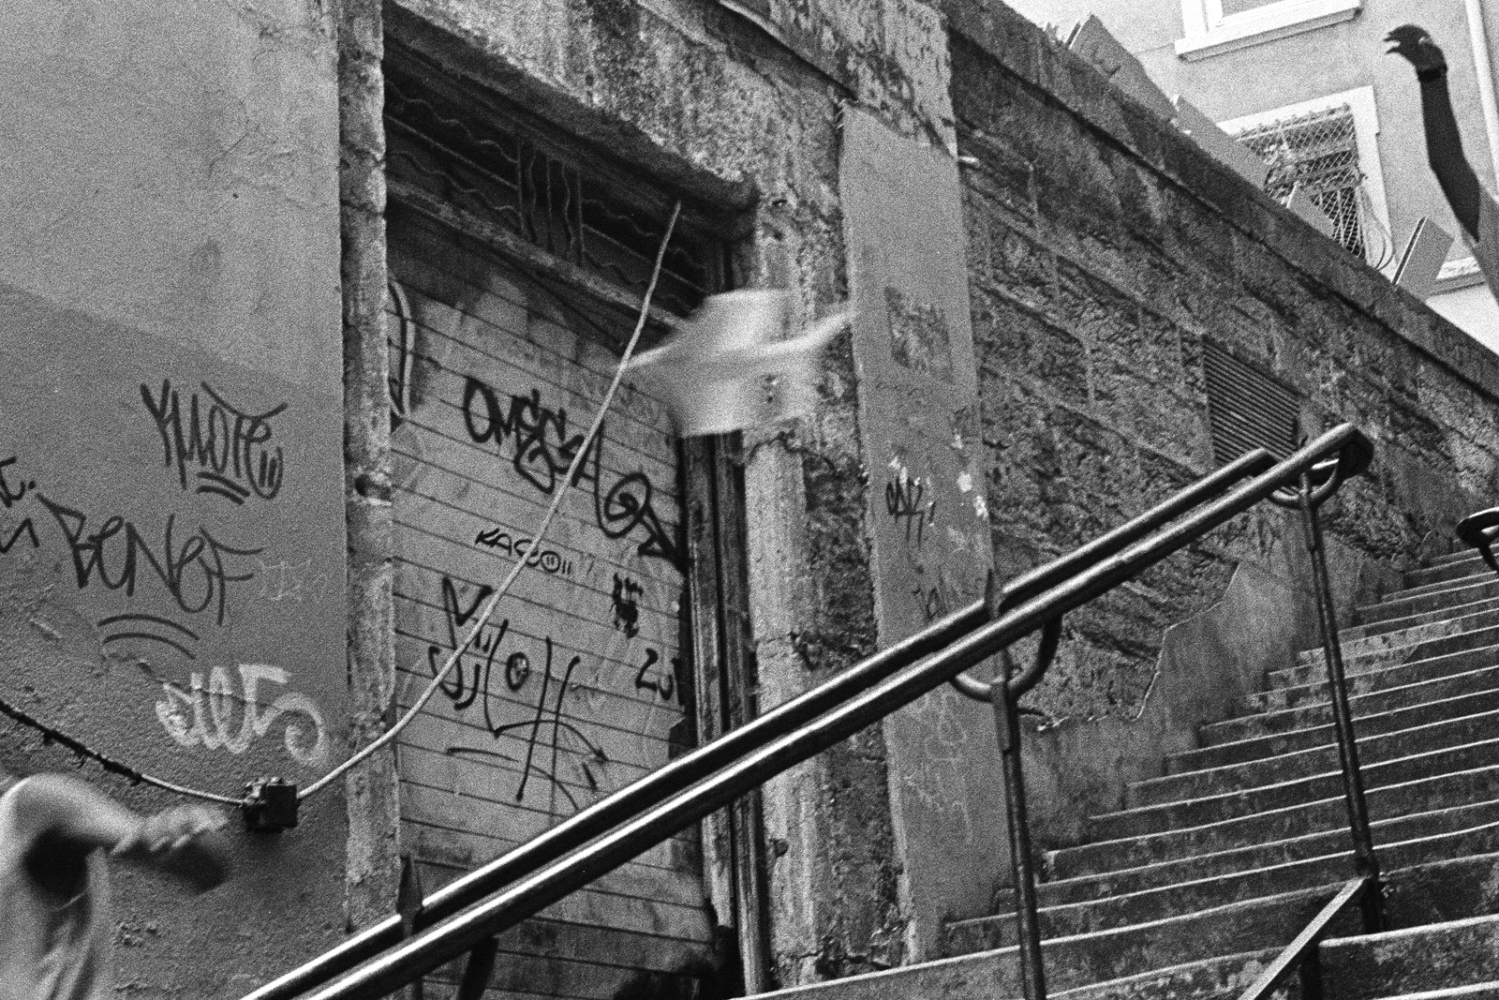 Art and Documentary Photography - Loading 046_Marseille___Fabio_Sgroi.jpg